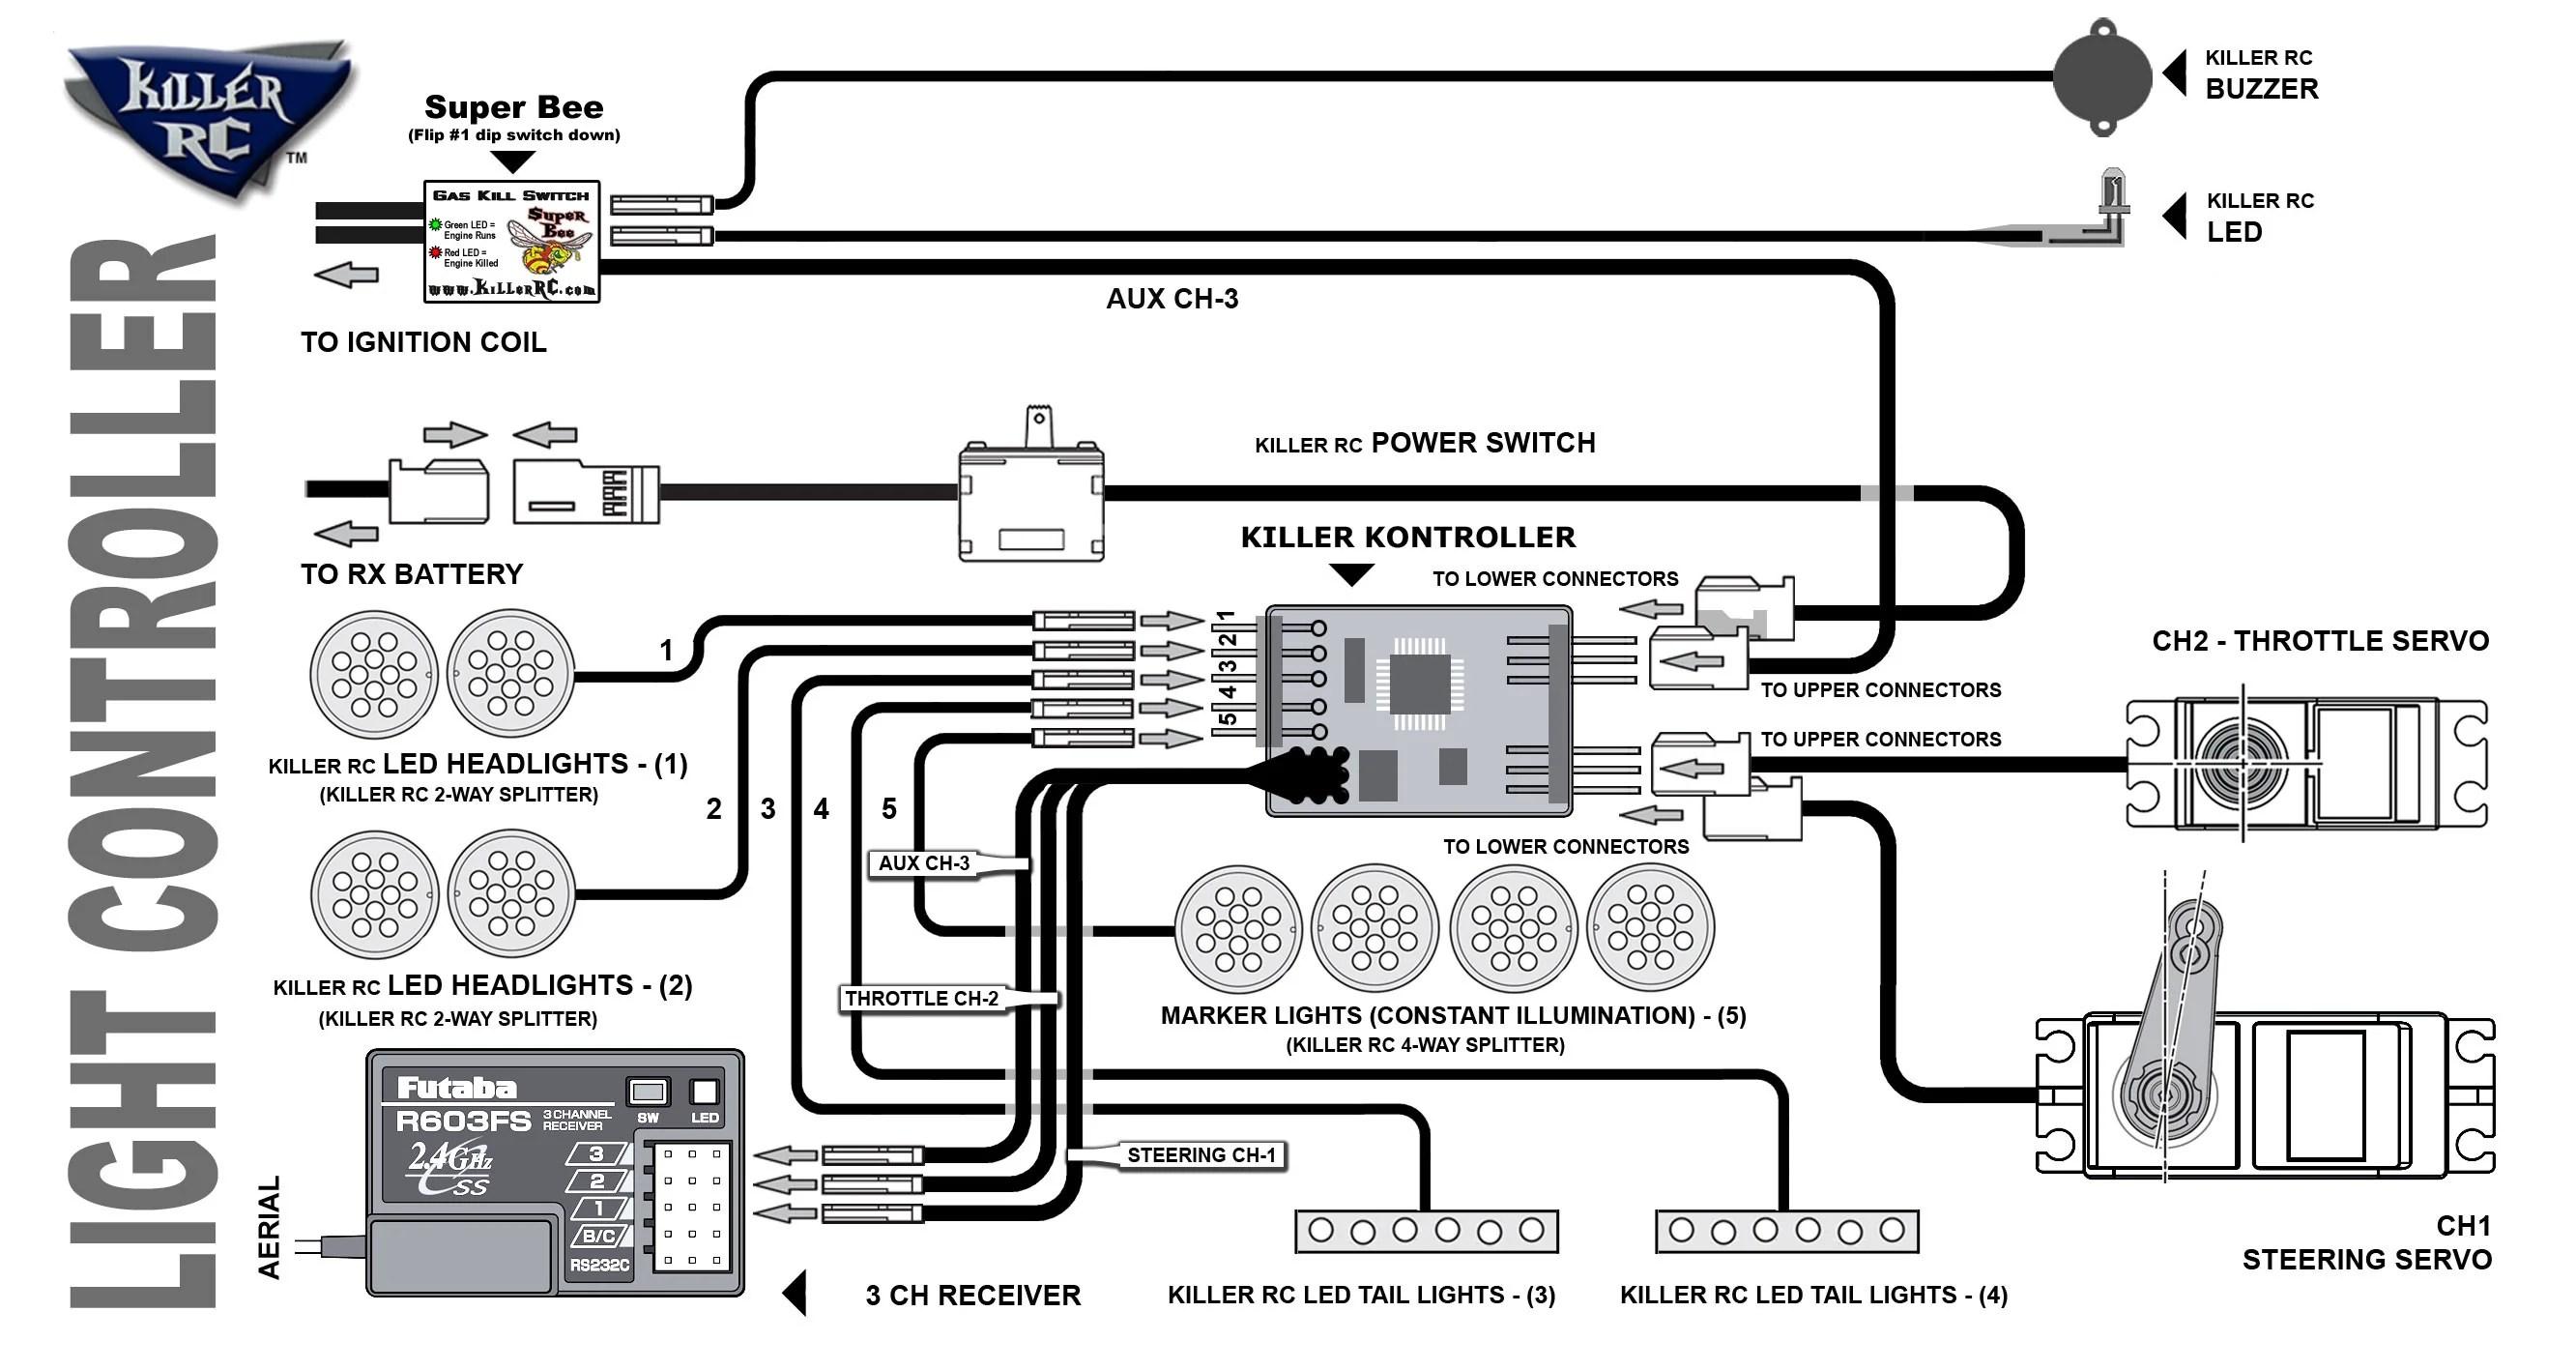 light controller diagram killer controller v3 3 channel configuration [ 2665 x 1417 Pixel ]